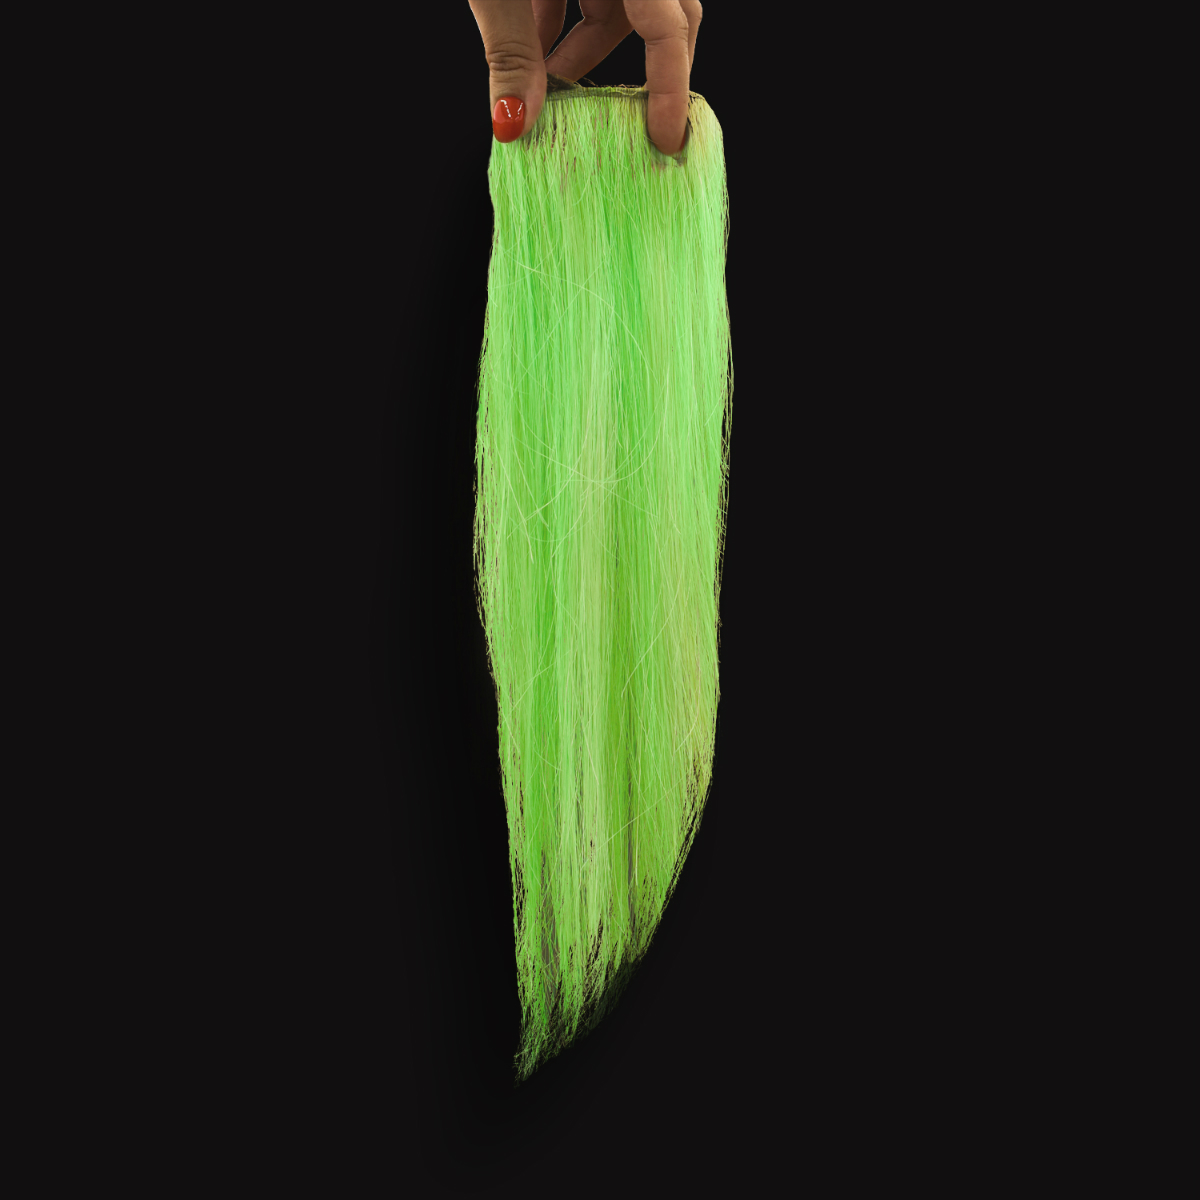 Ofarbana kosa na tresi